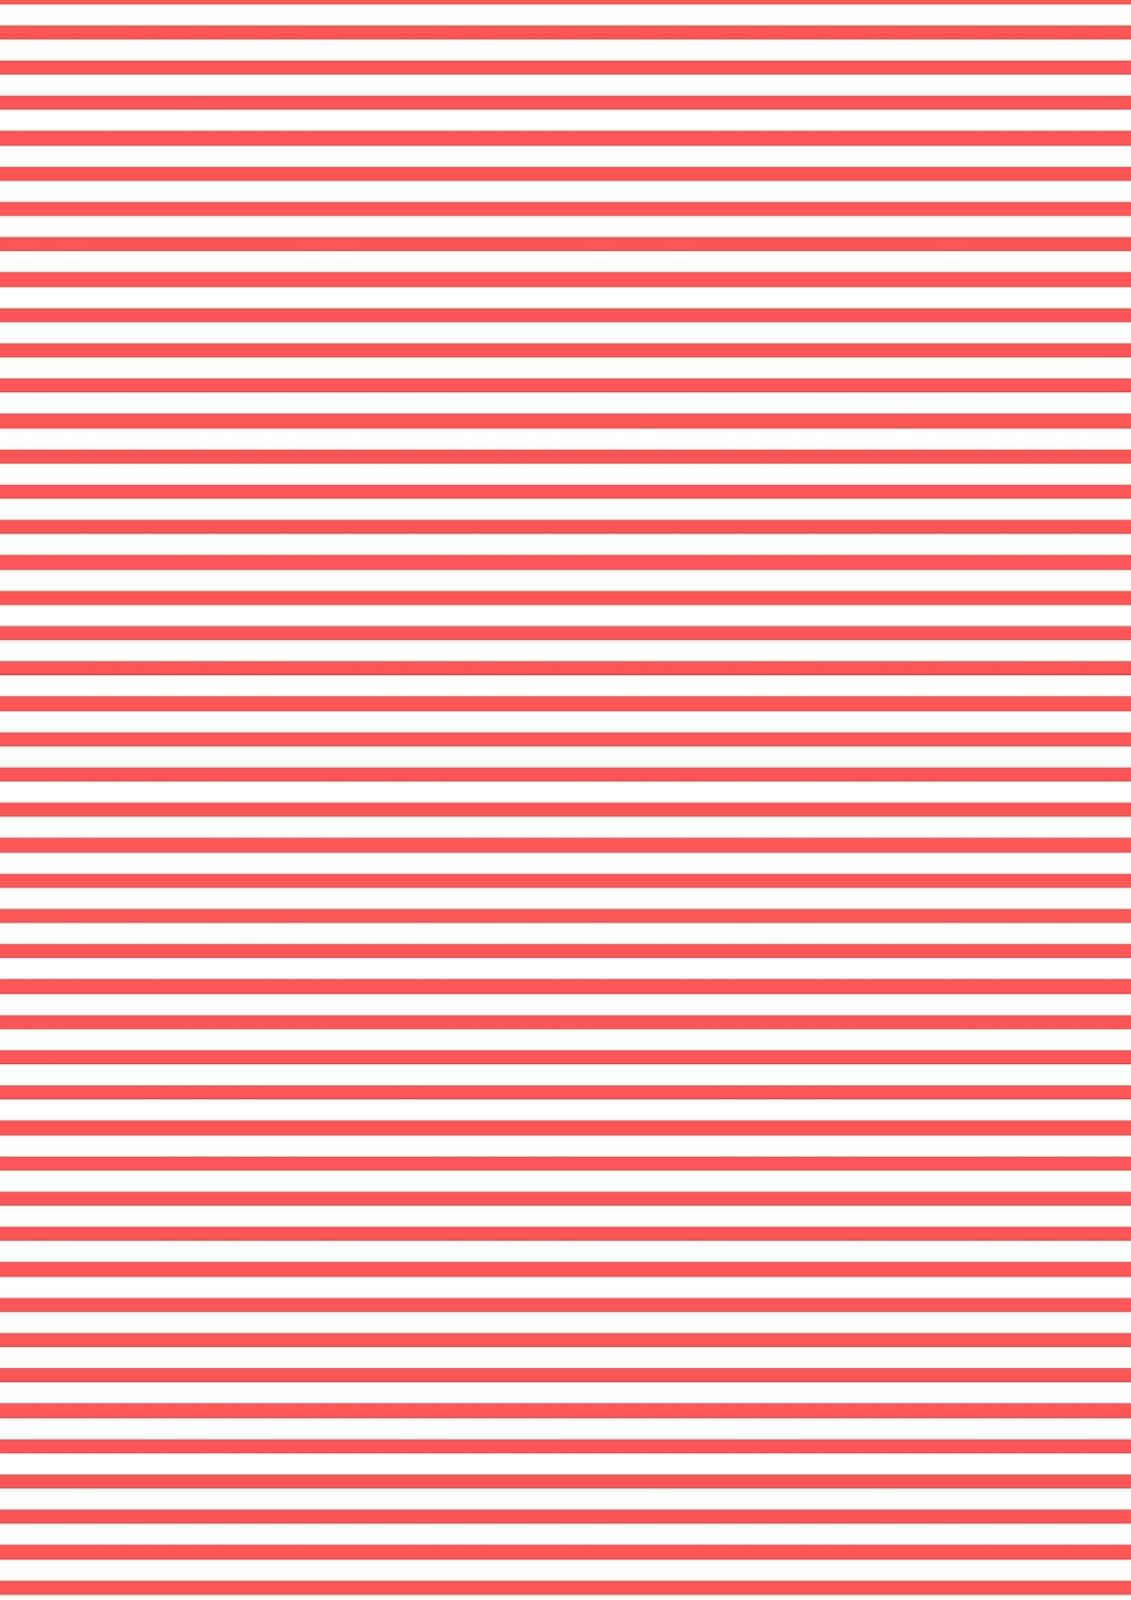 Free Printable Stars And Stripes Pattern Papers Ausdruckbares Geschenkpapier Freebie Printable Paper Pattern Paper Printable Star